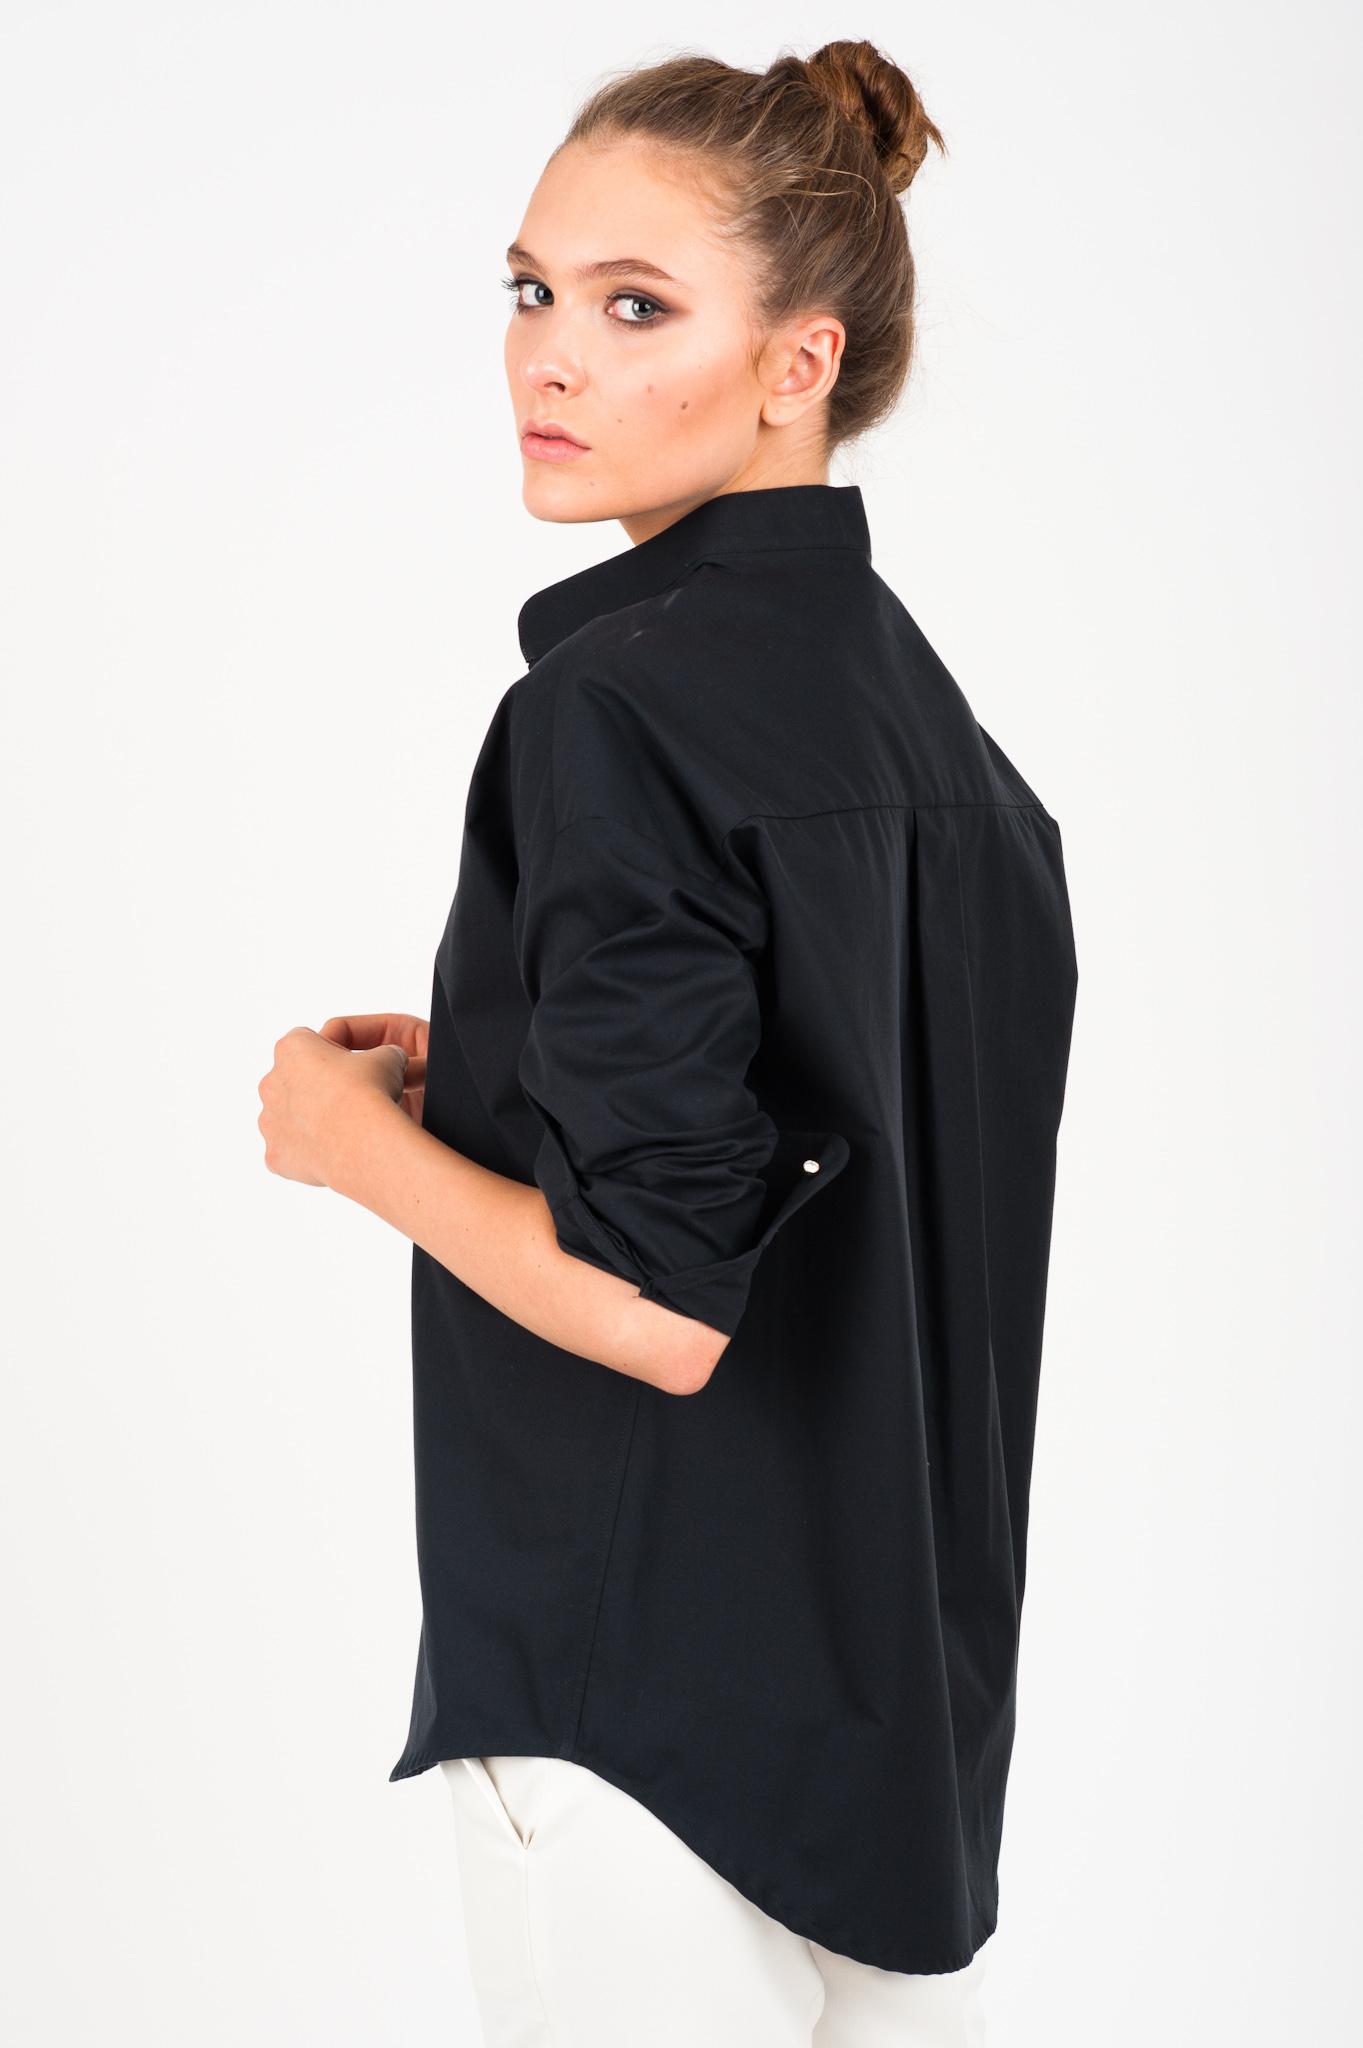 7458d11dd479ce czarna koszula ze stójką Vero, damska, o klasycznym i luźnym kroju